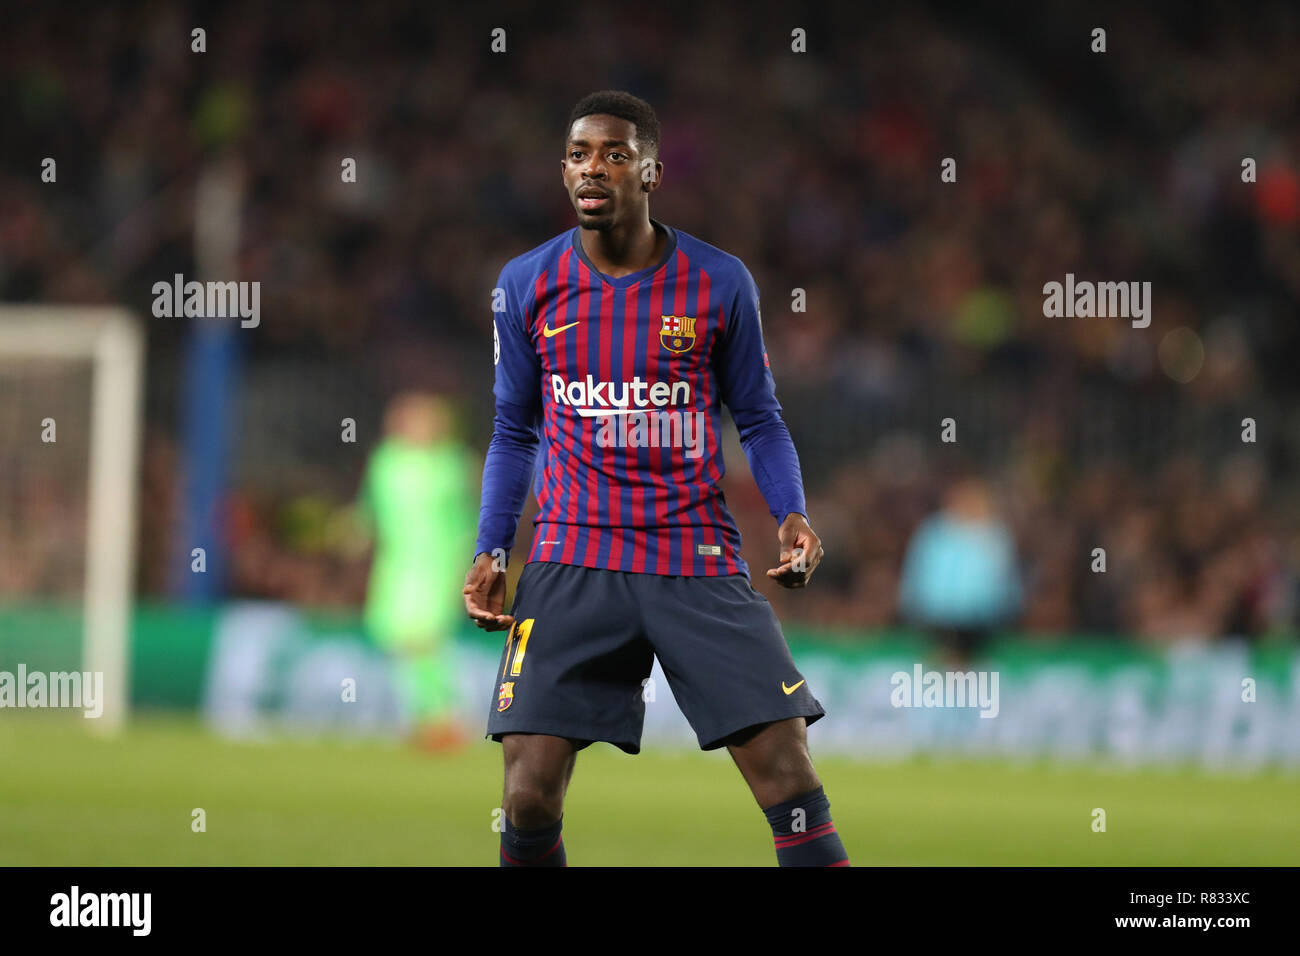 42c5285f7da December 10, 2018 - Barcelona, Spain - Ousmane Dembele of Barcelona during  the UEFA Champions League ...